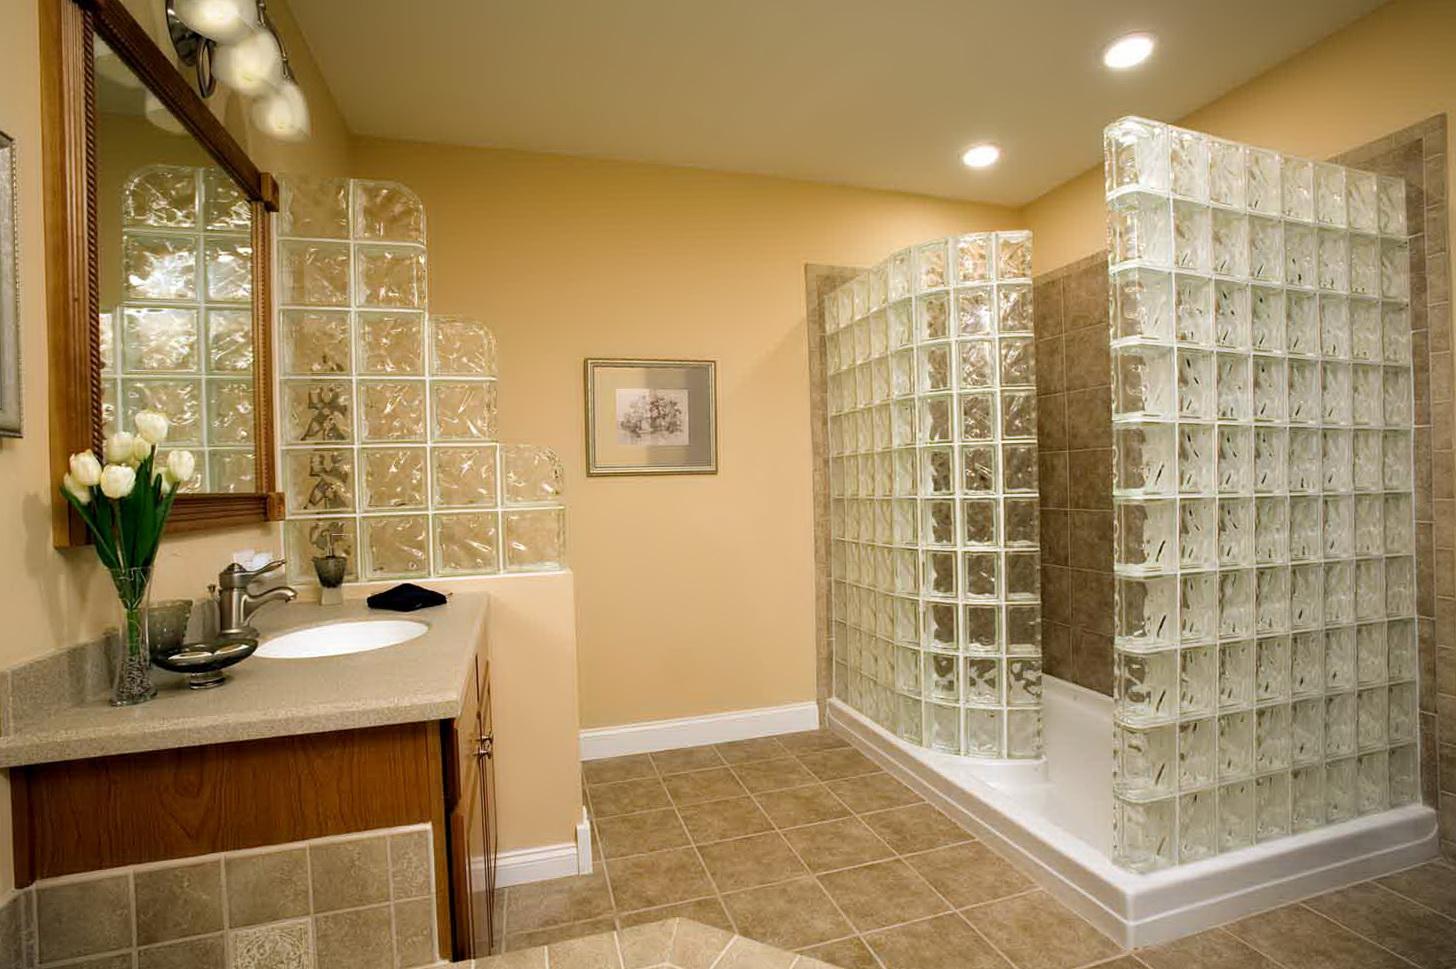 Bathroom Renovation Ideas 2013